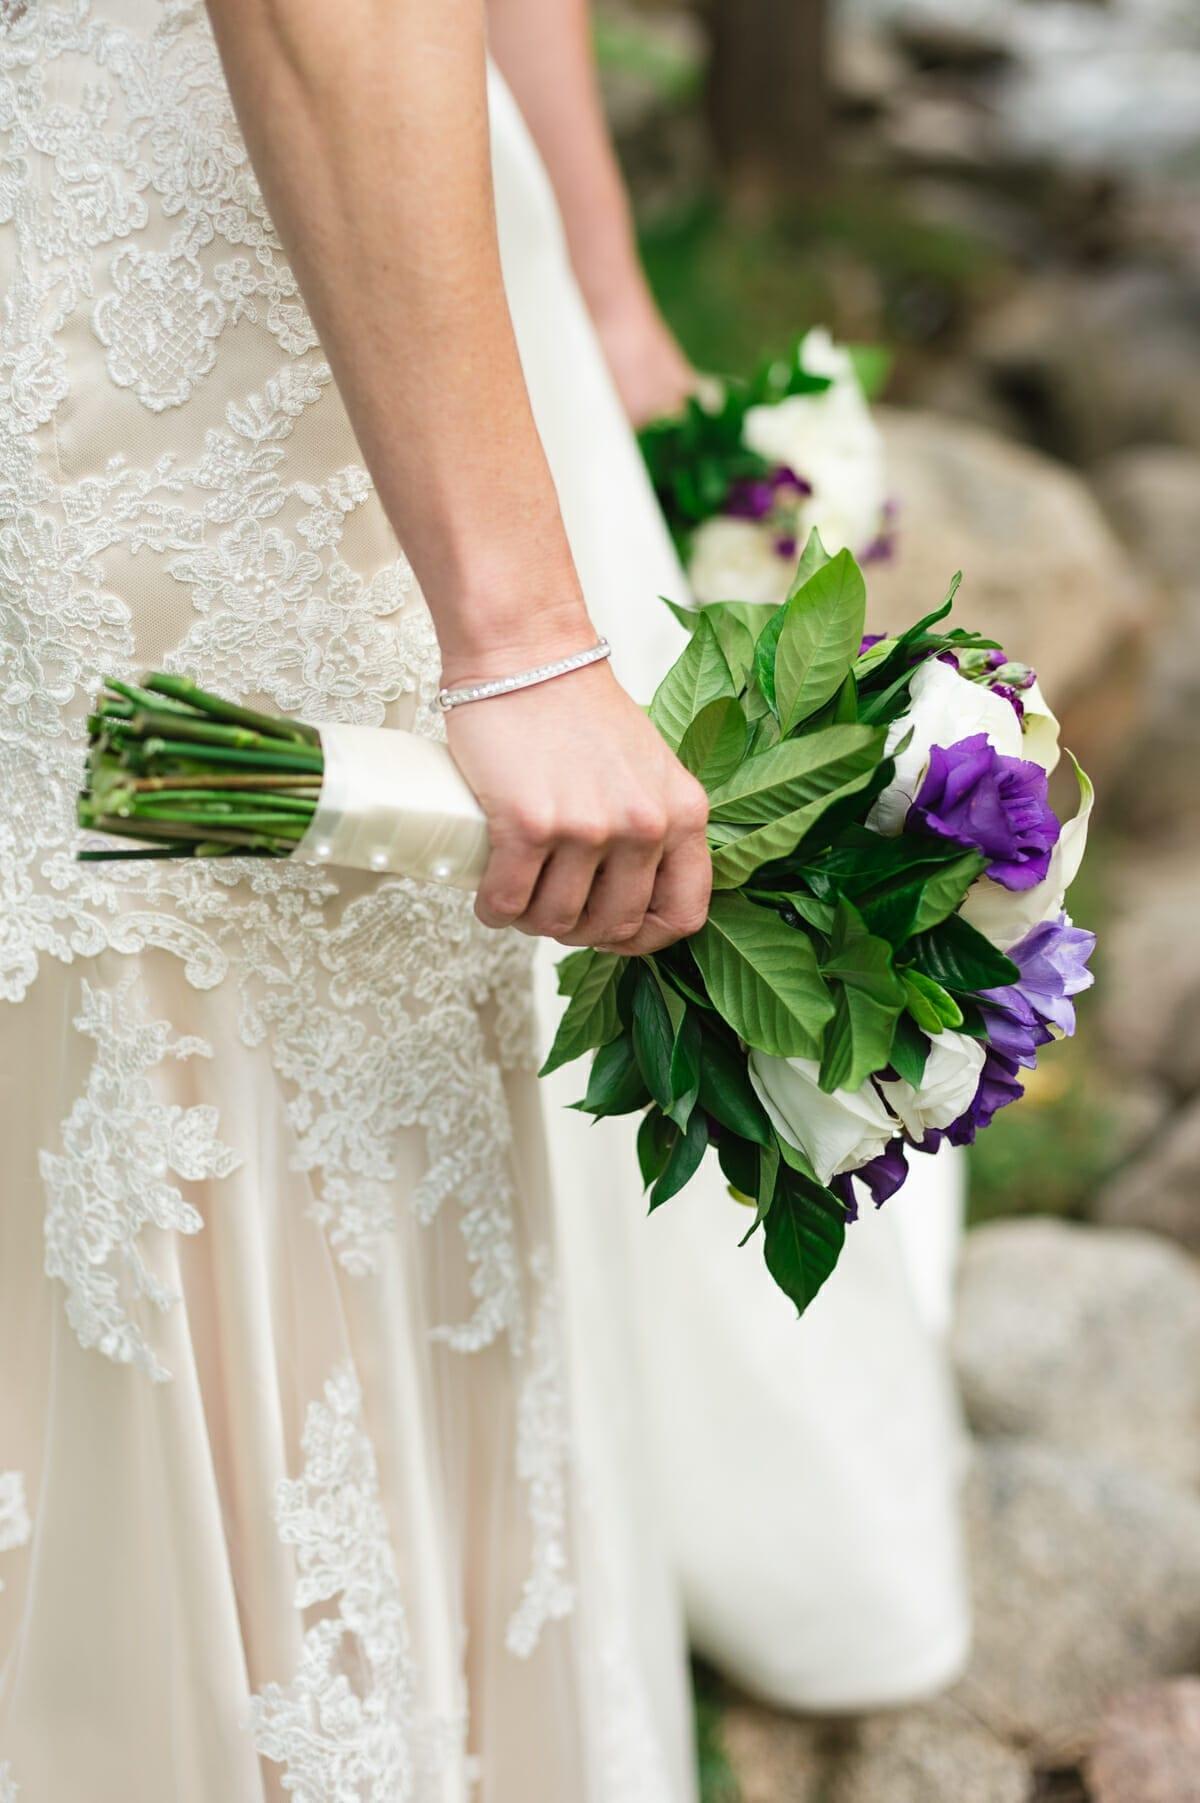 Documentary wedding photography | Colorado same-sex wedding photography | From the Hip Photo